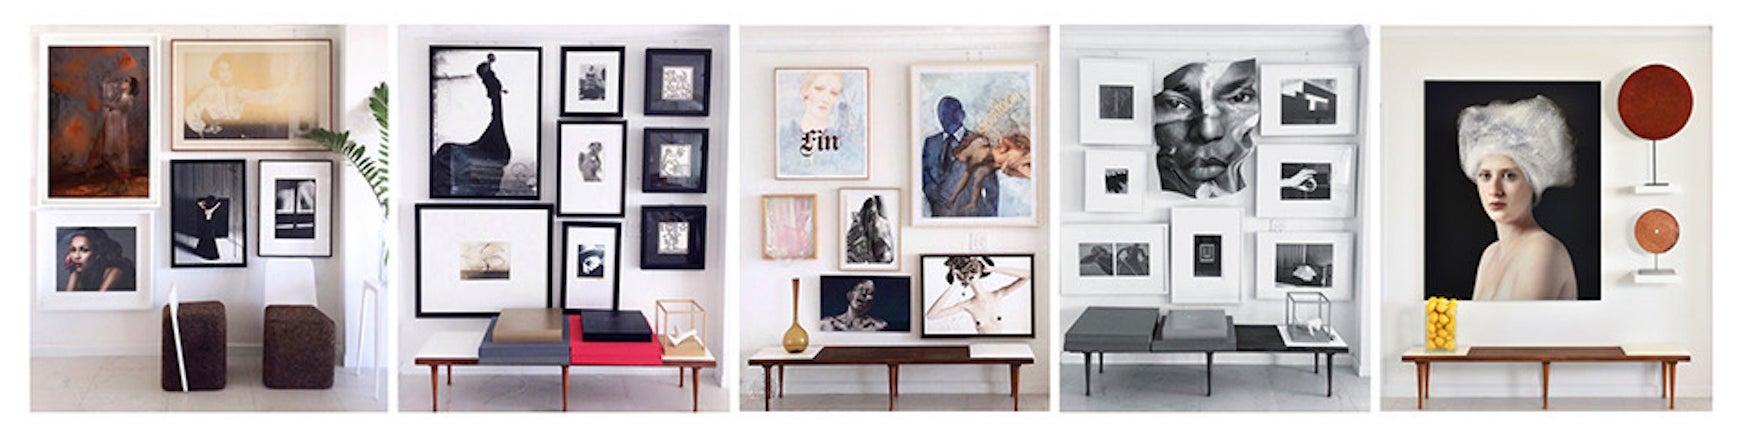 The Art Design Project Furniture